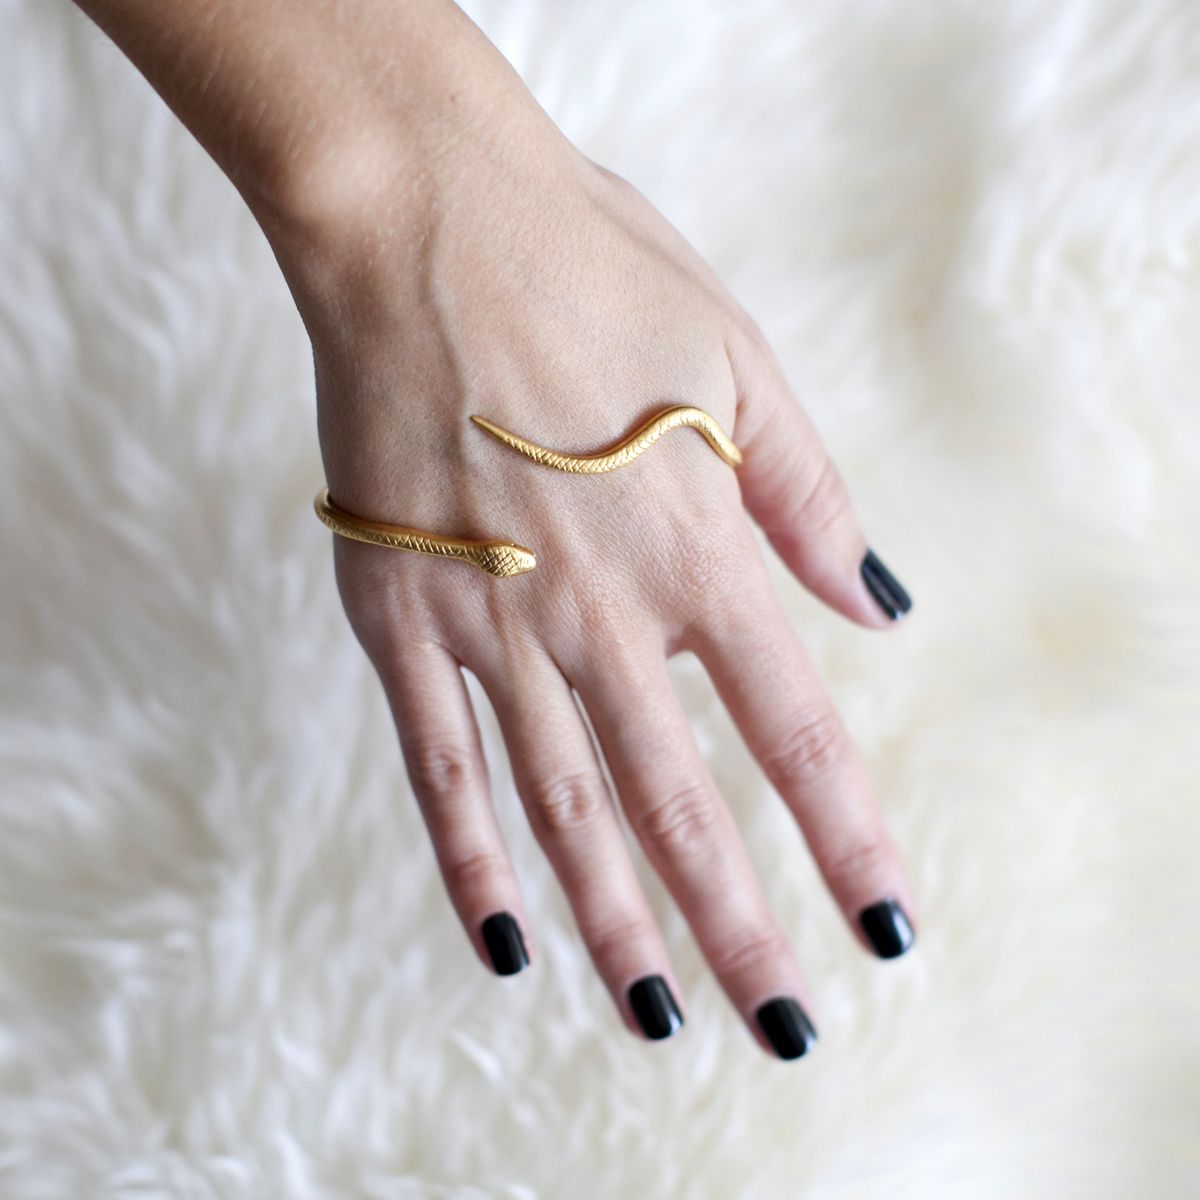 GOLD SNAKE HAND WRAP Reminds me of a snake I smuggled from Florida ...